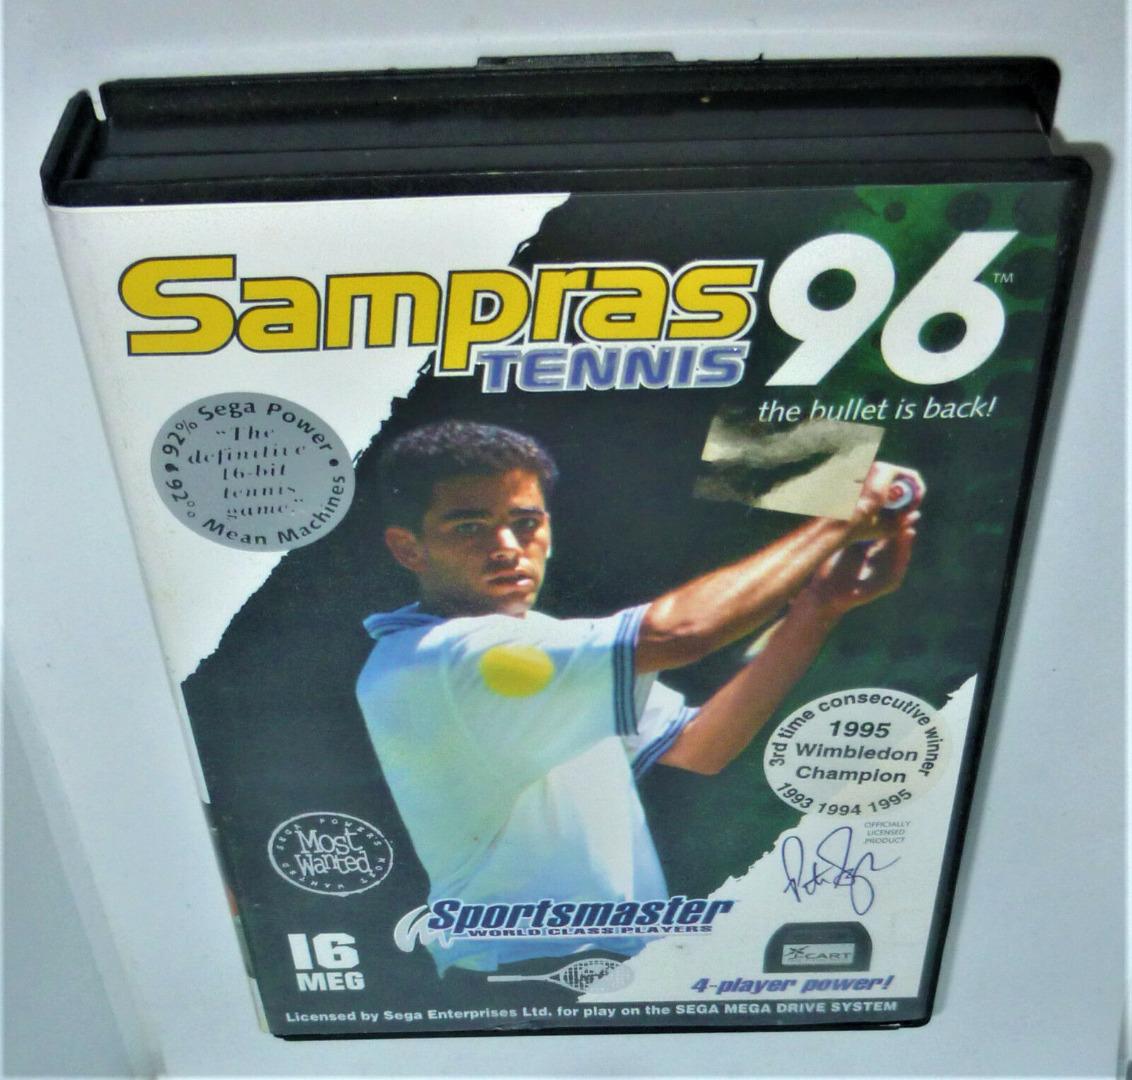 Sampras Tennis 96 - Codemasters 2